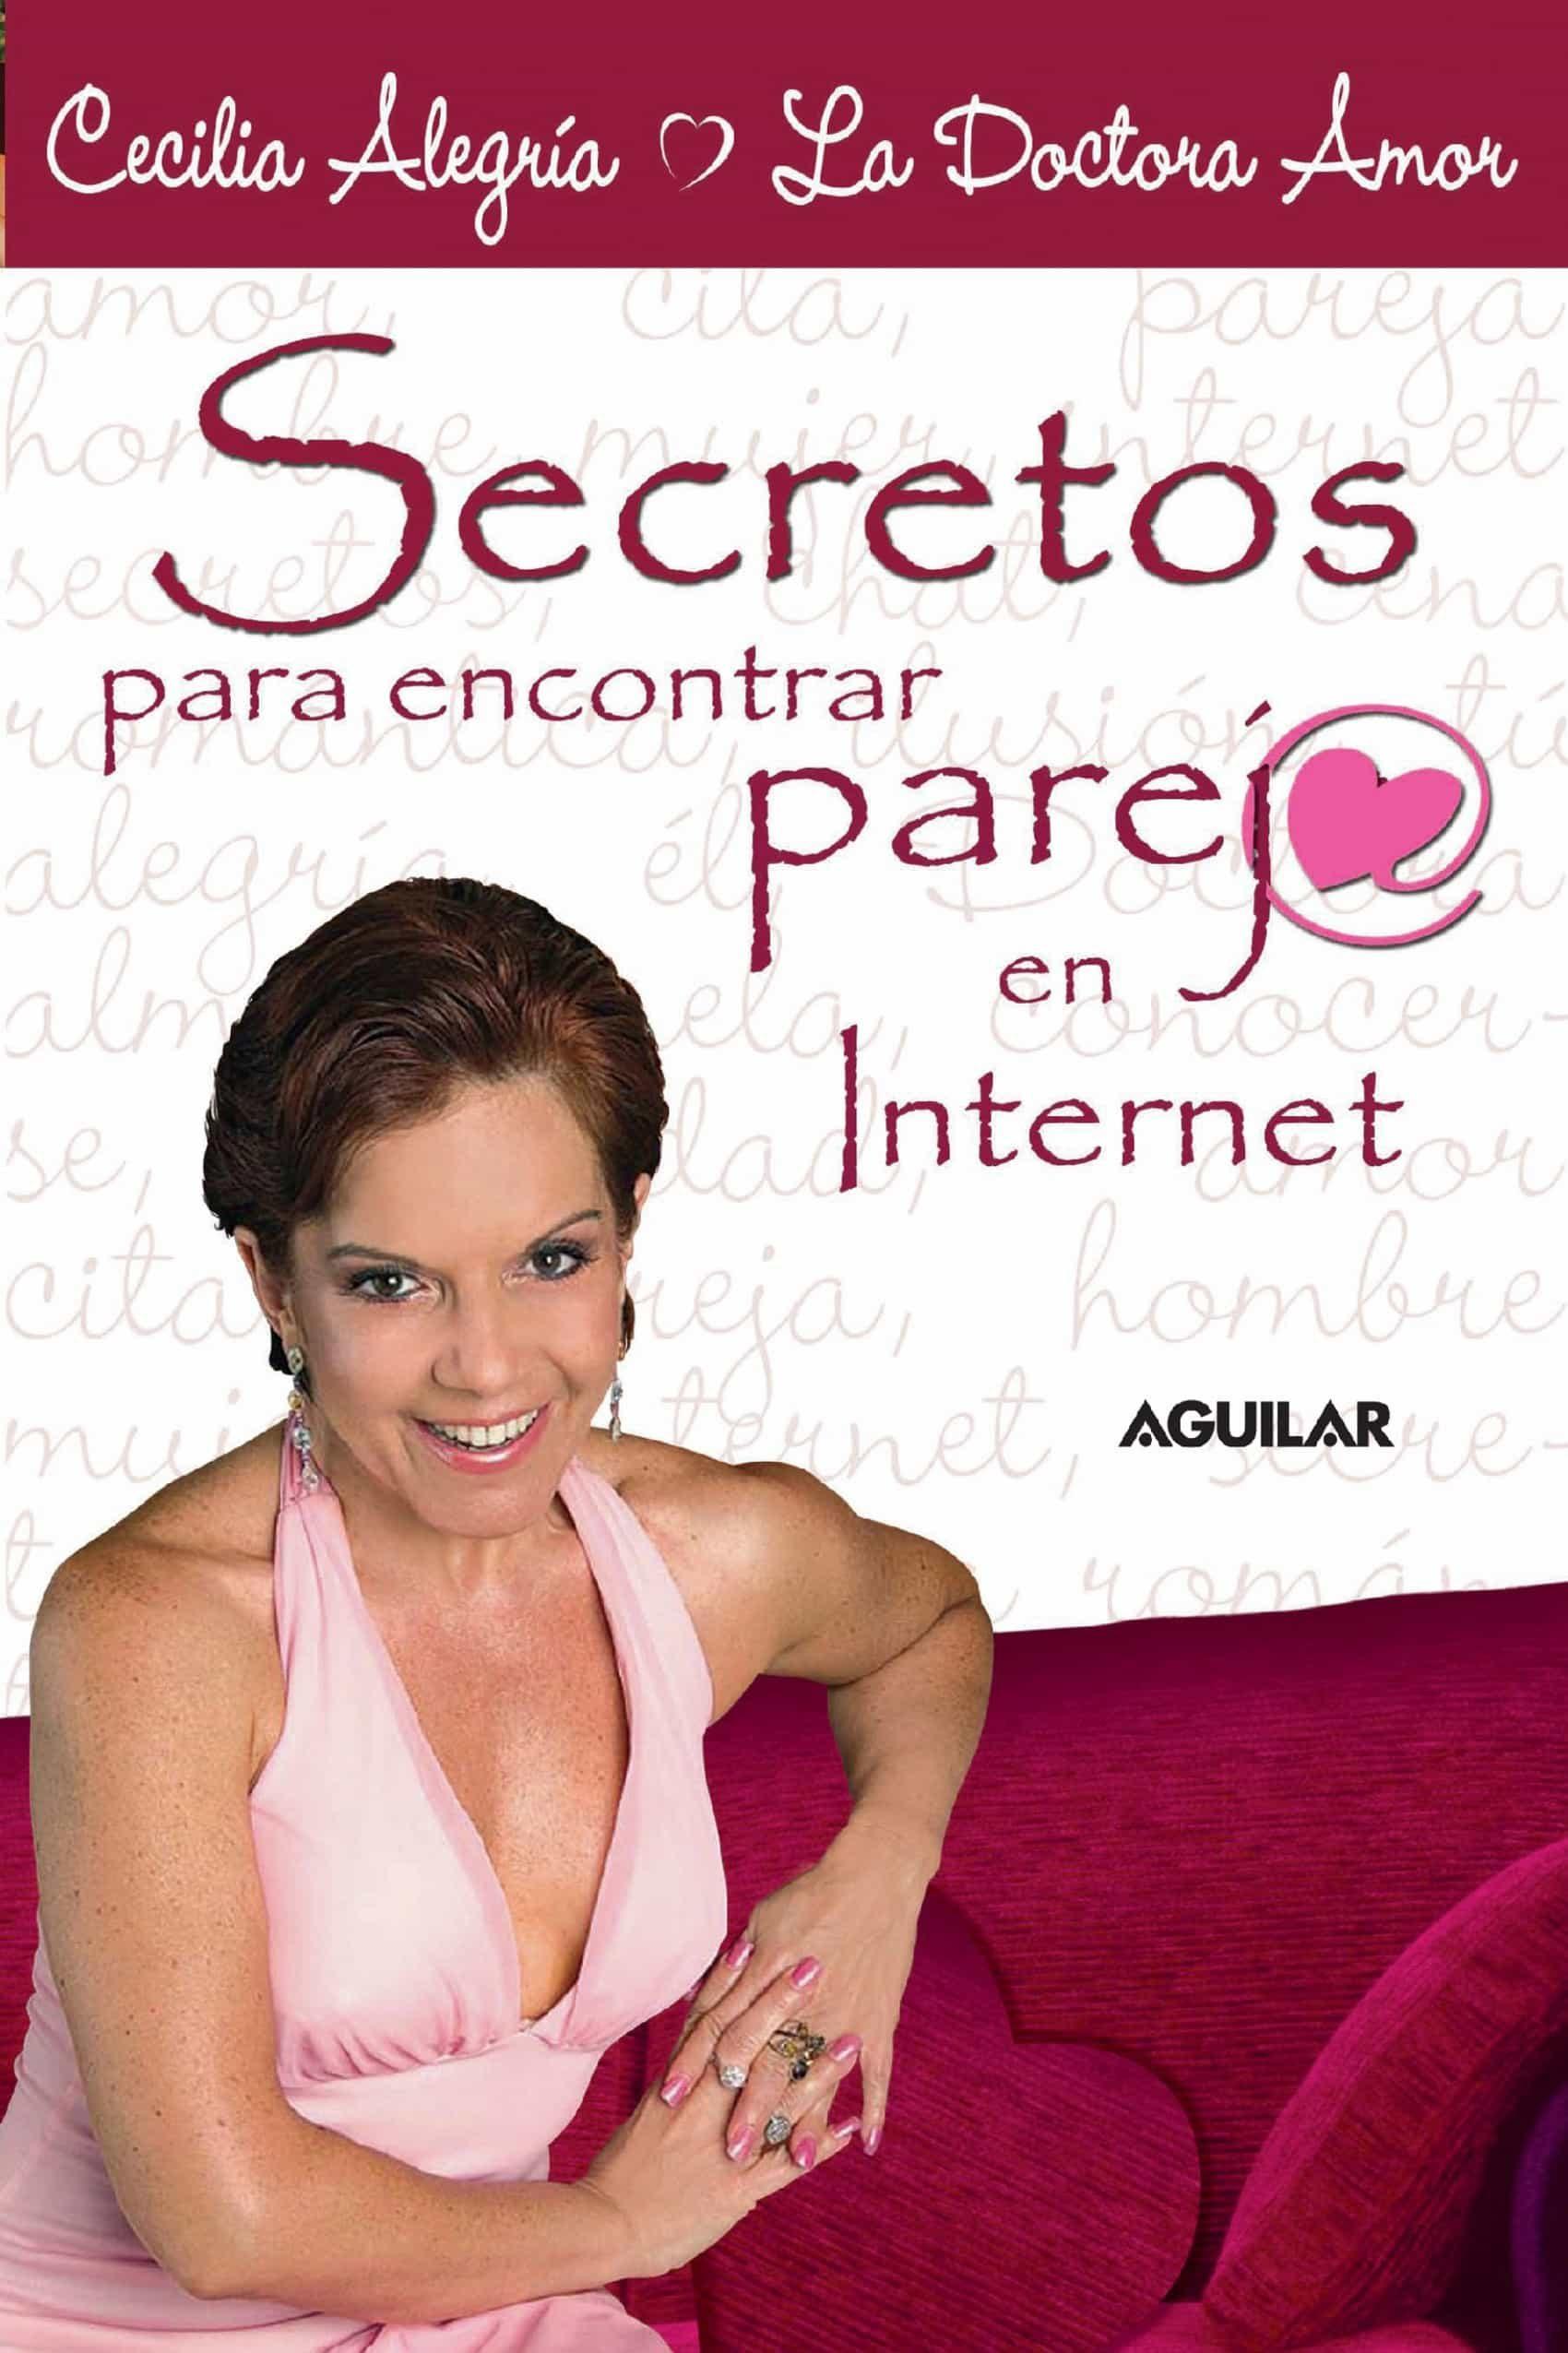 Buscar pareja por internet gratis